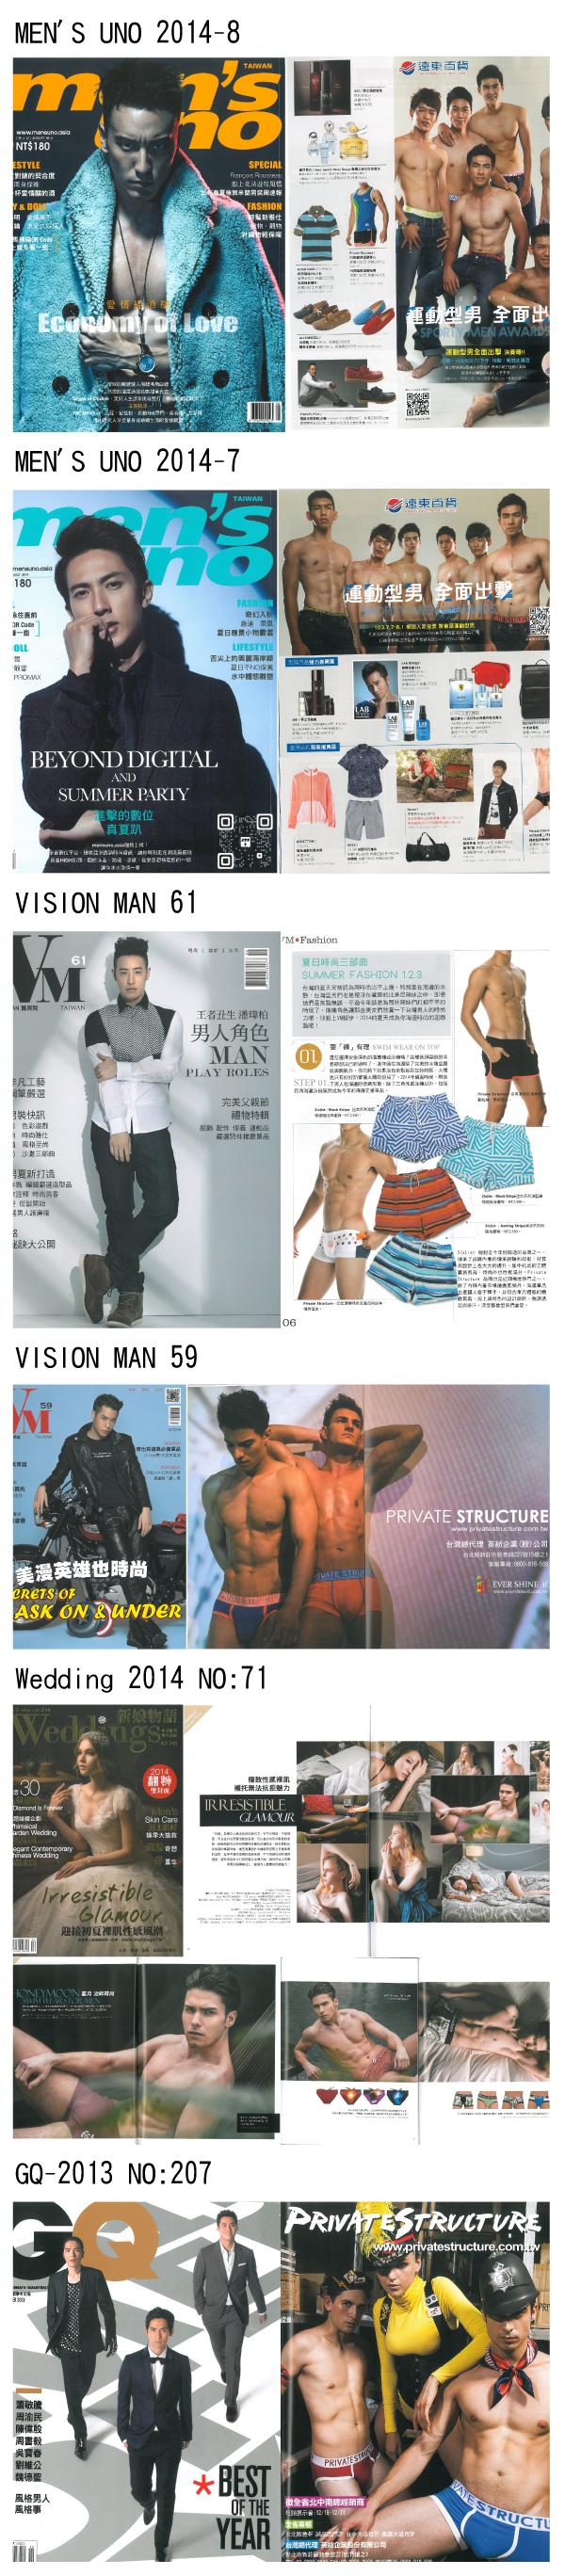 http://www.momoshop.com.tw/expertimg/0003/731/640/ps-magazine.jpg?t=1448563109